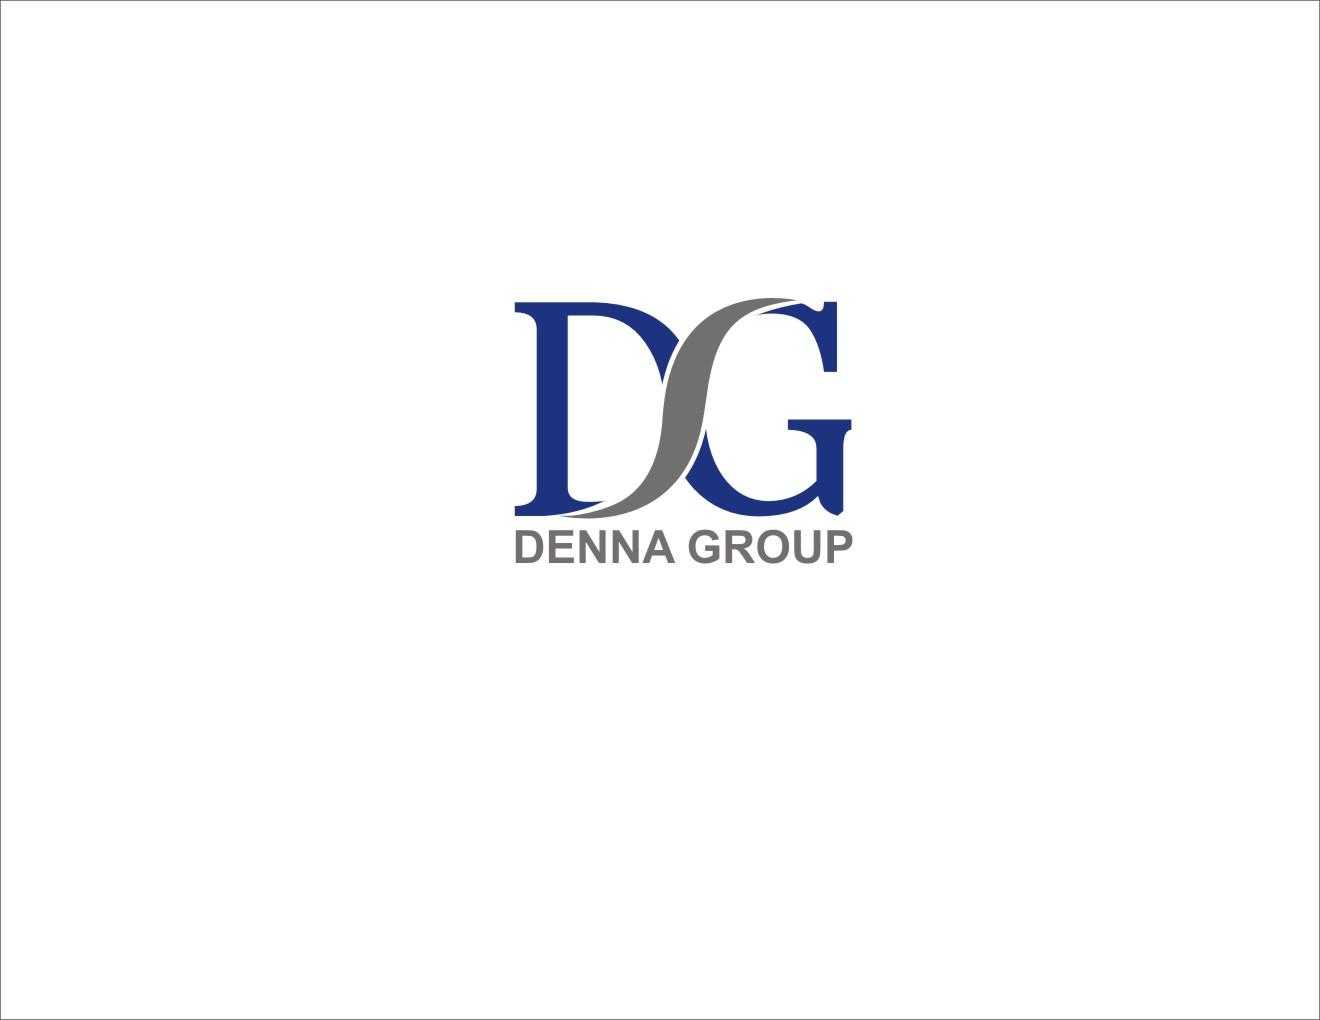 Logo Design by Private User - Entry No. 160 in the Logo Design Contest Denna Group Logo Design.